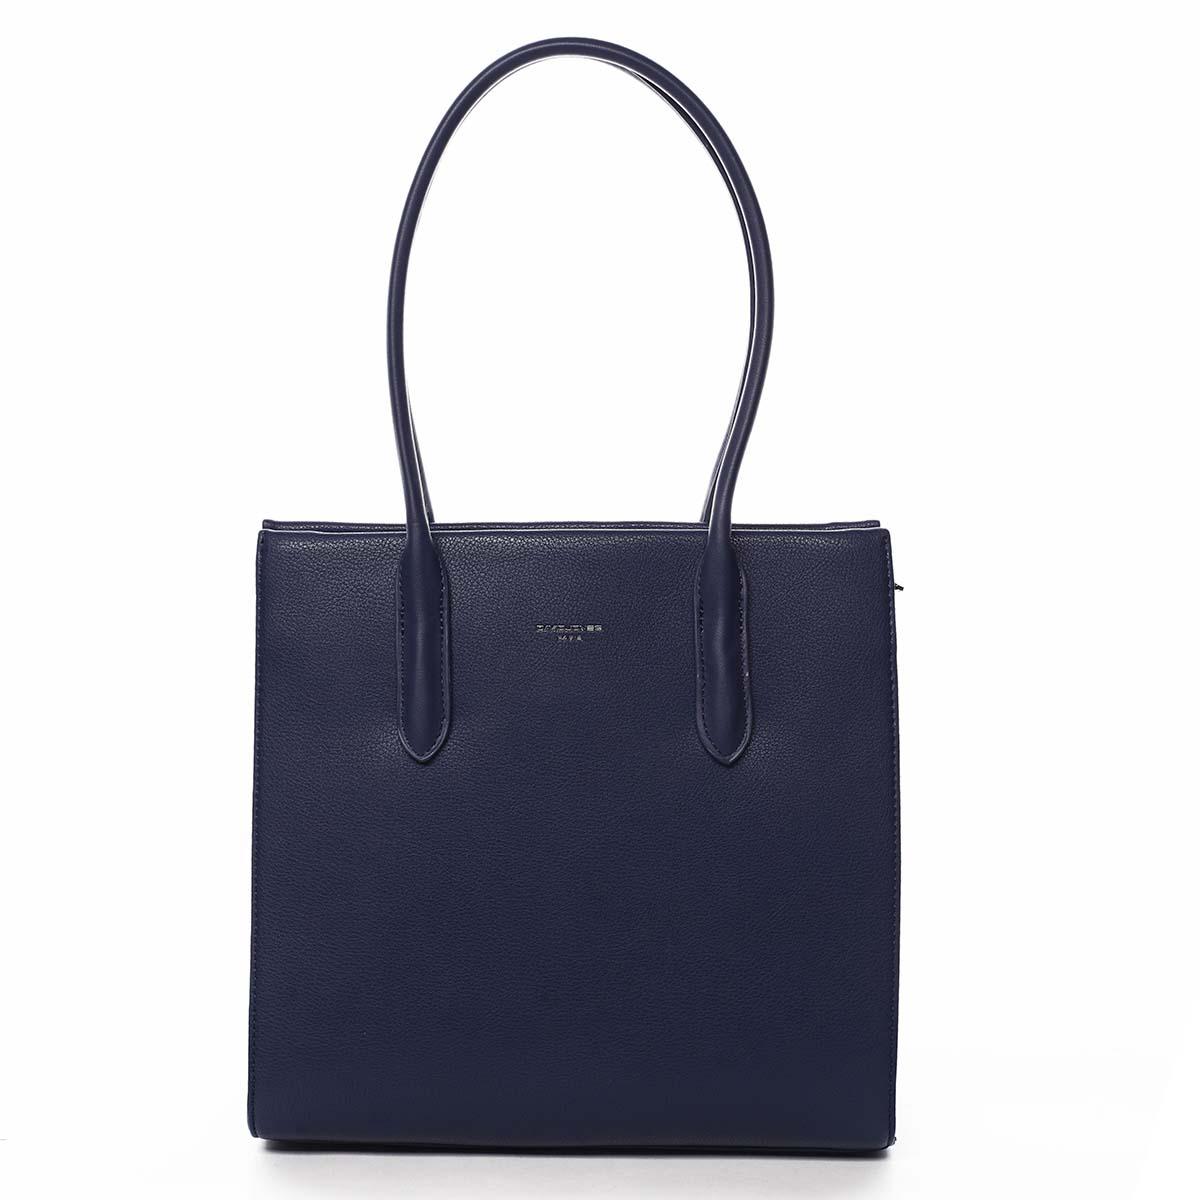 Dámská kabelka přes rameno tmavě modrá - David Jones Sementis